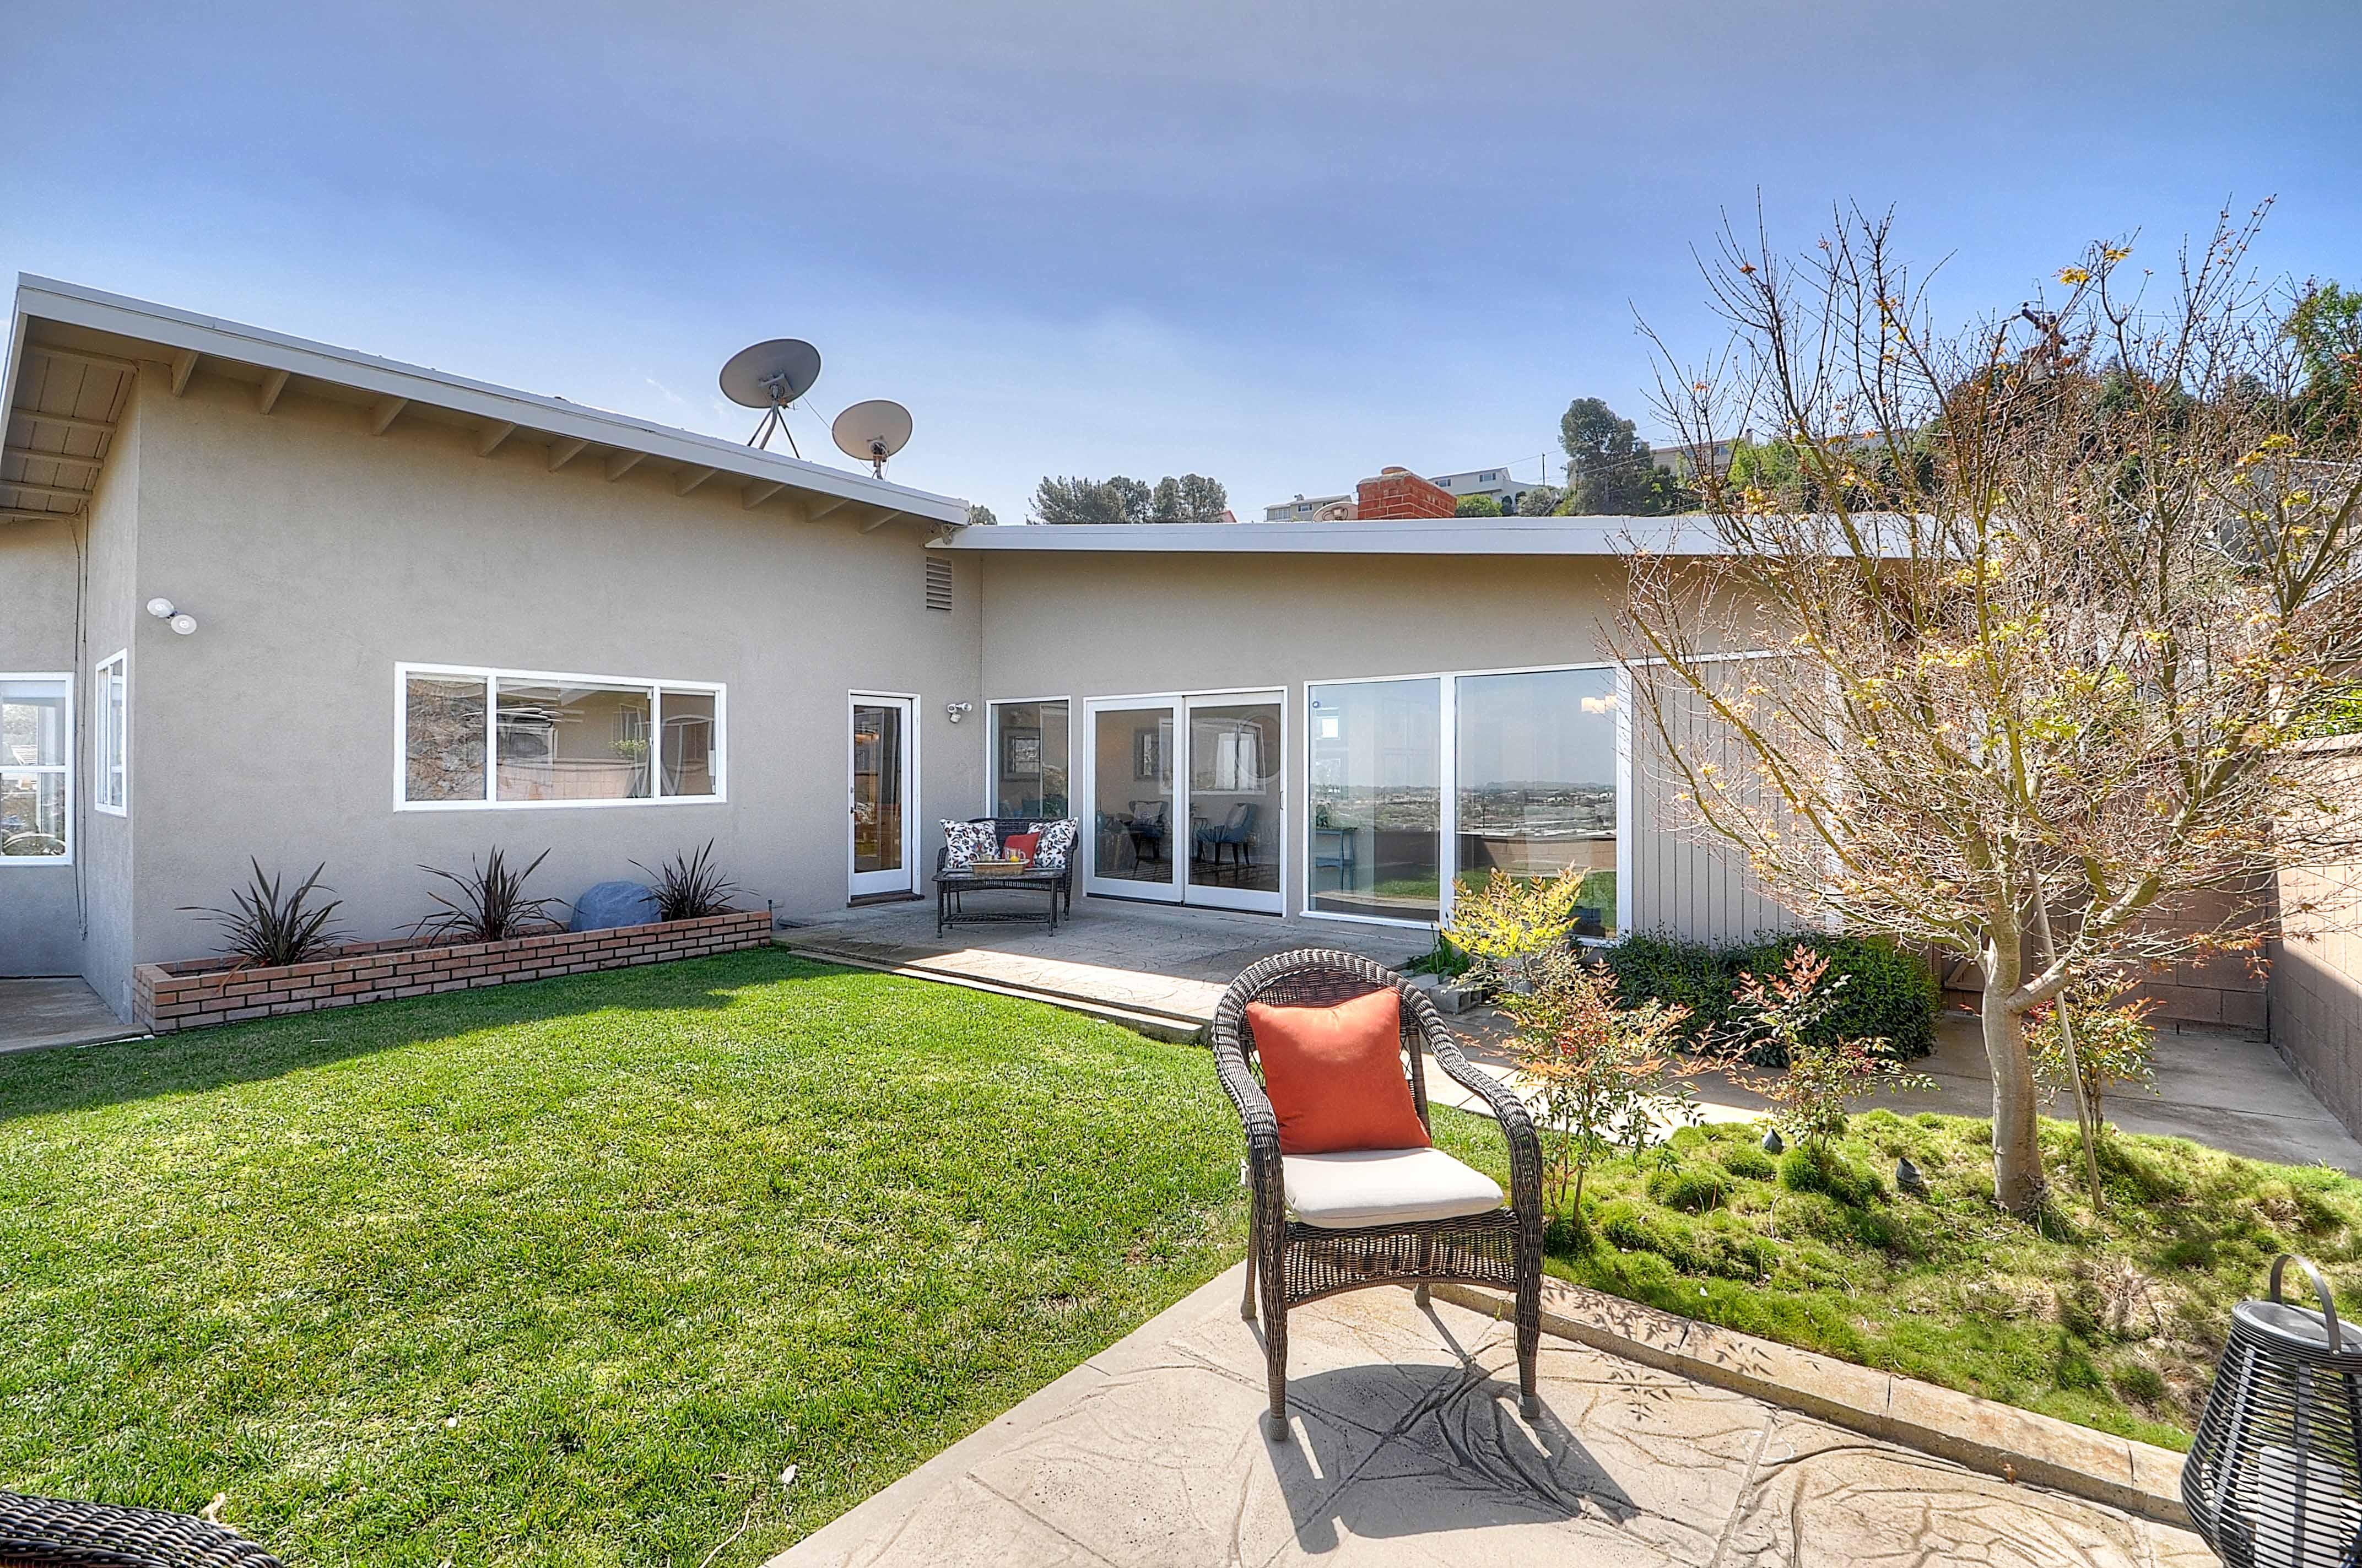 4515-Vista-Largo-backyard1-Copy